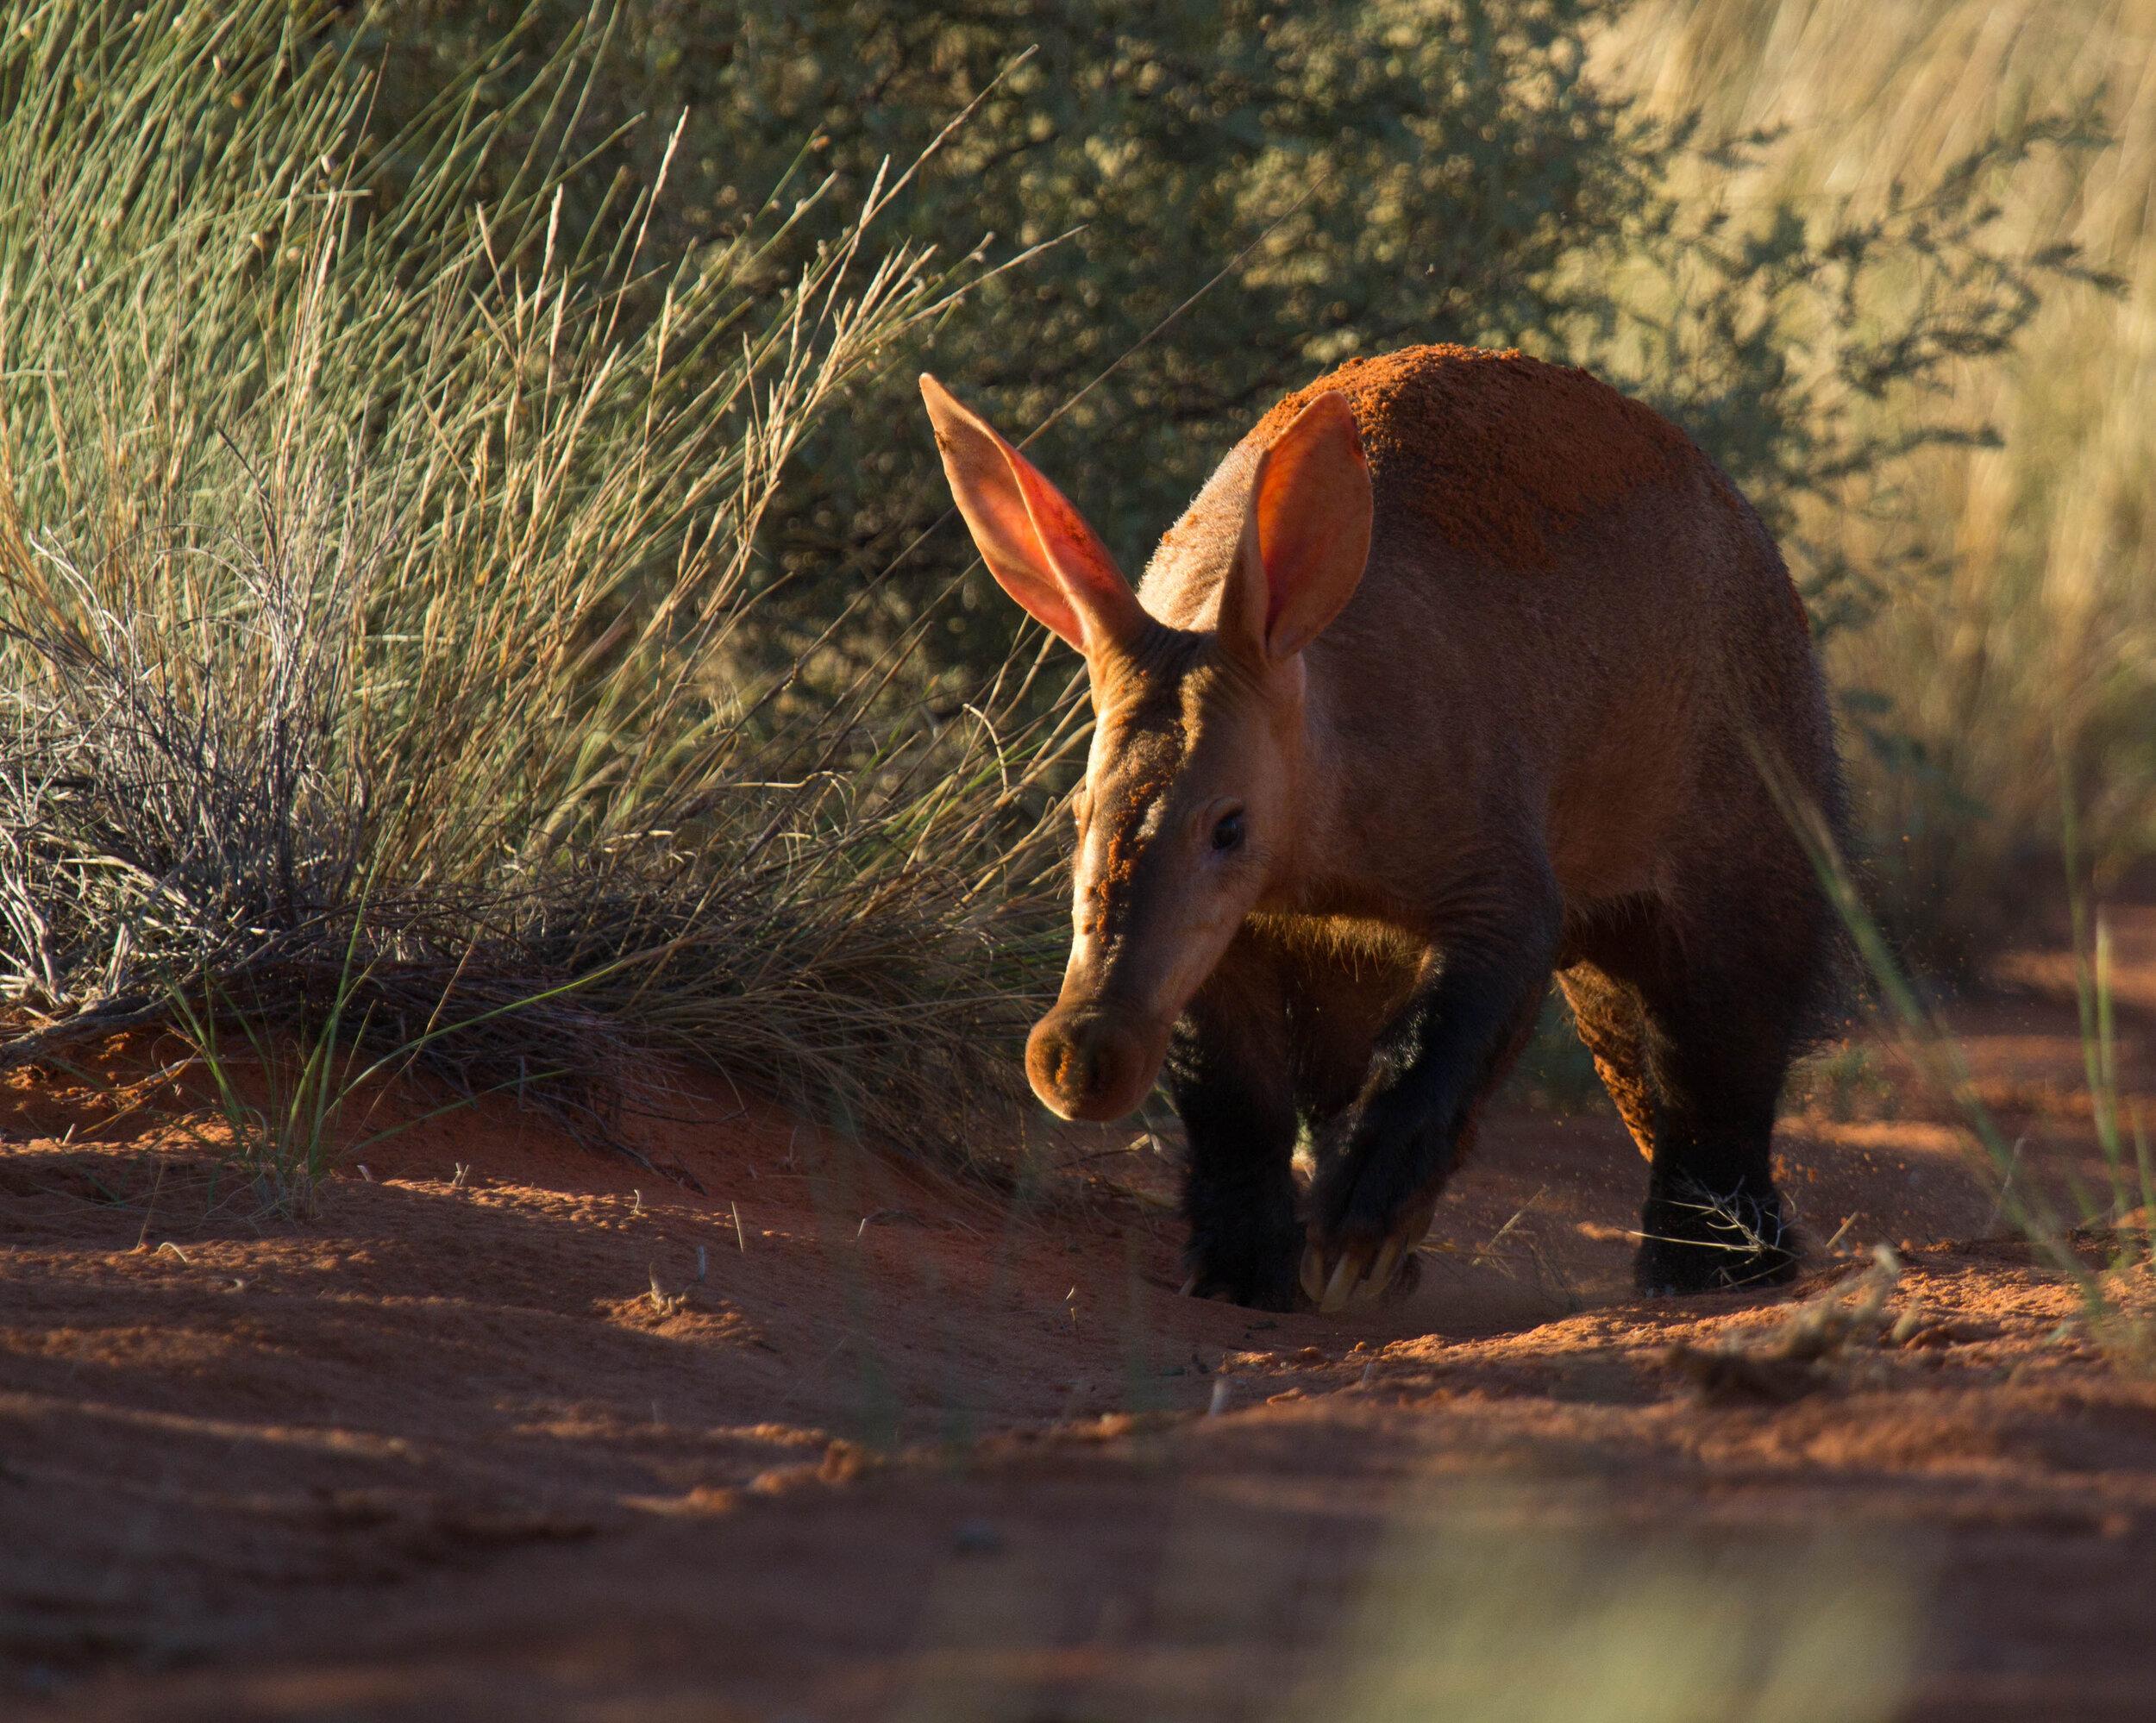 Tswalu's unique wildlife encounters